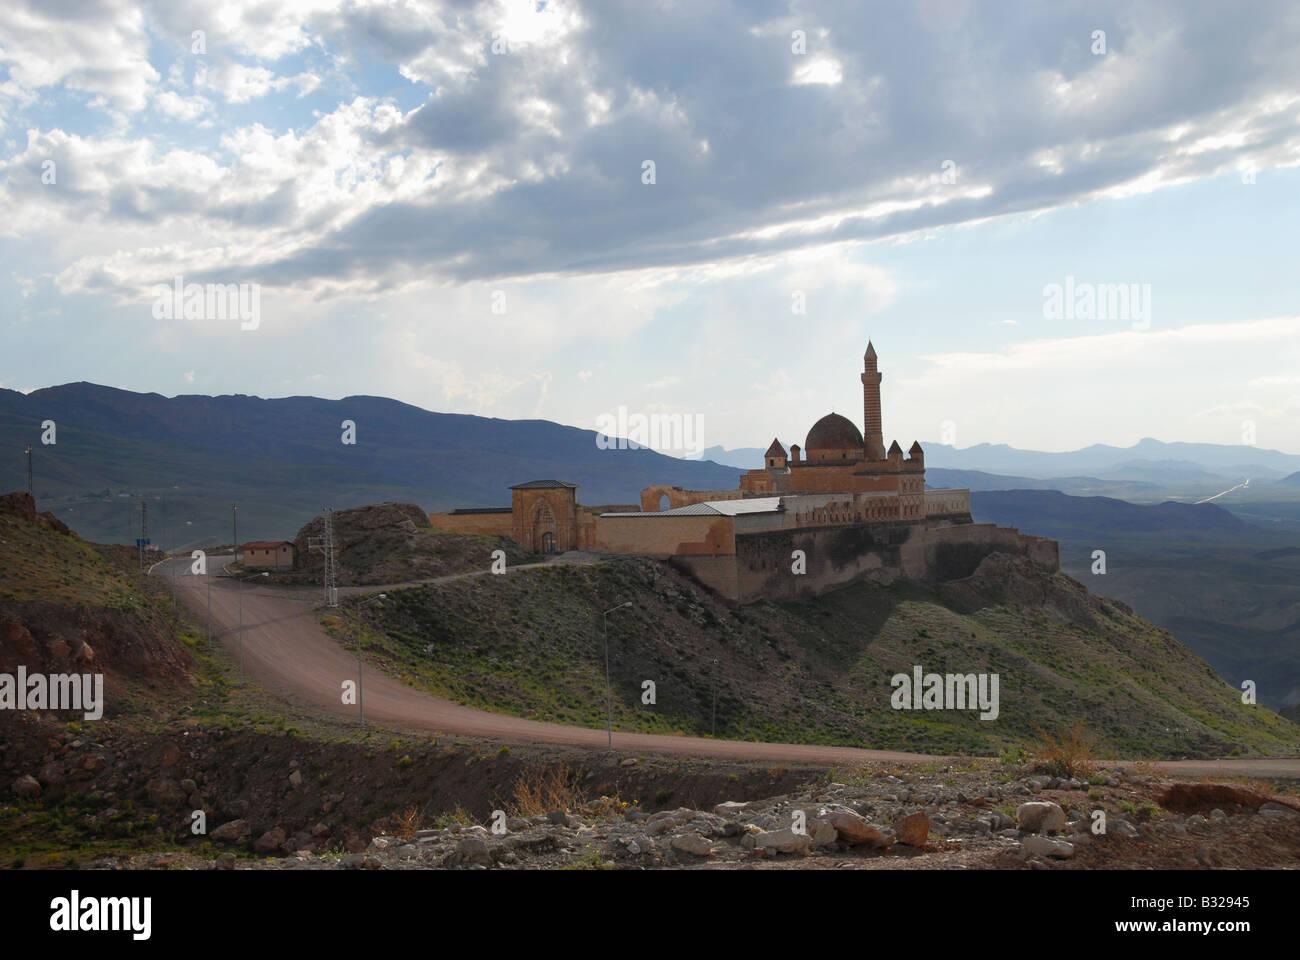 Ishak Pasa Palace in Turkey - Stock Image